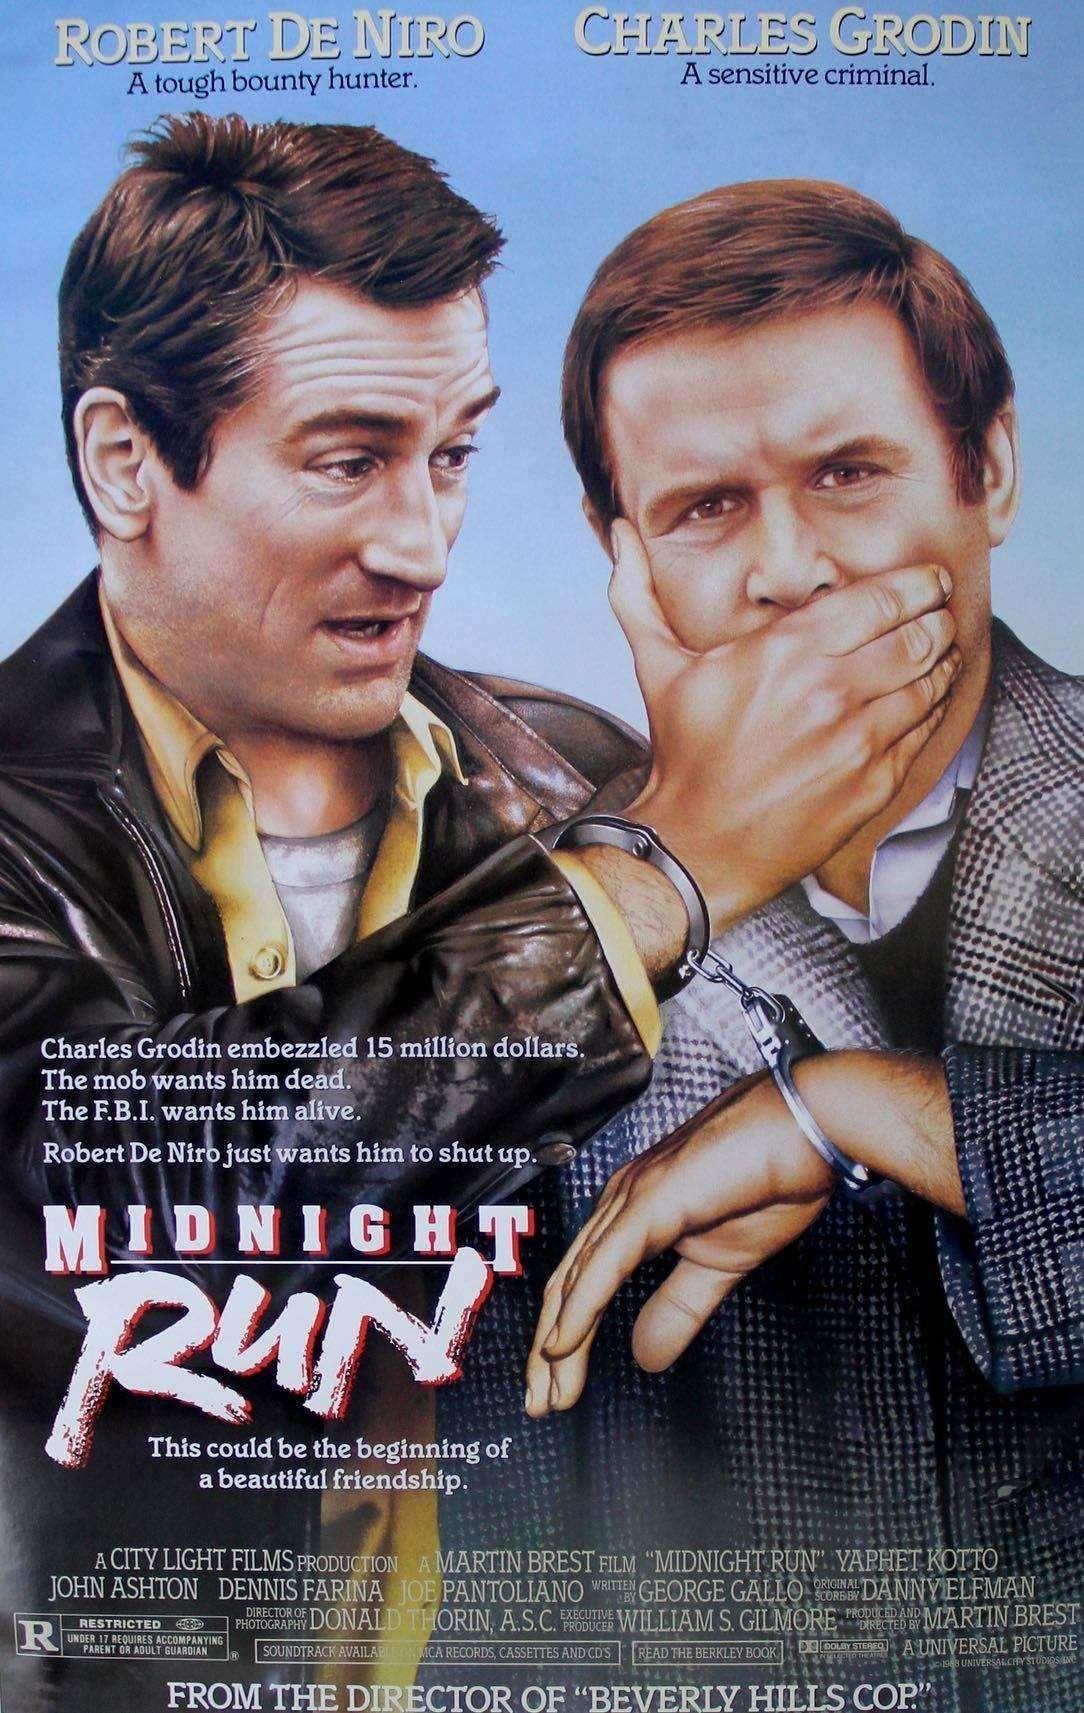 MIDNIGHT RUN Robert de Niro Rétro Film T Shirt